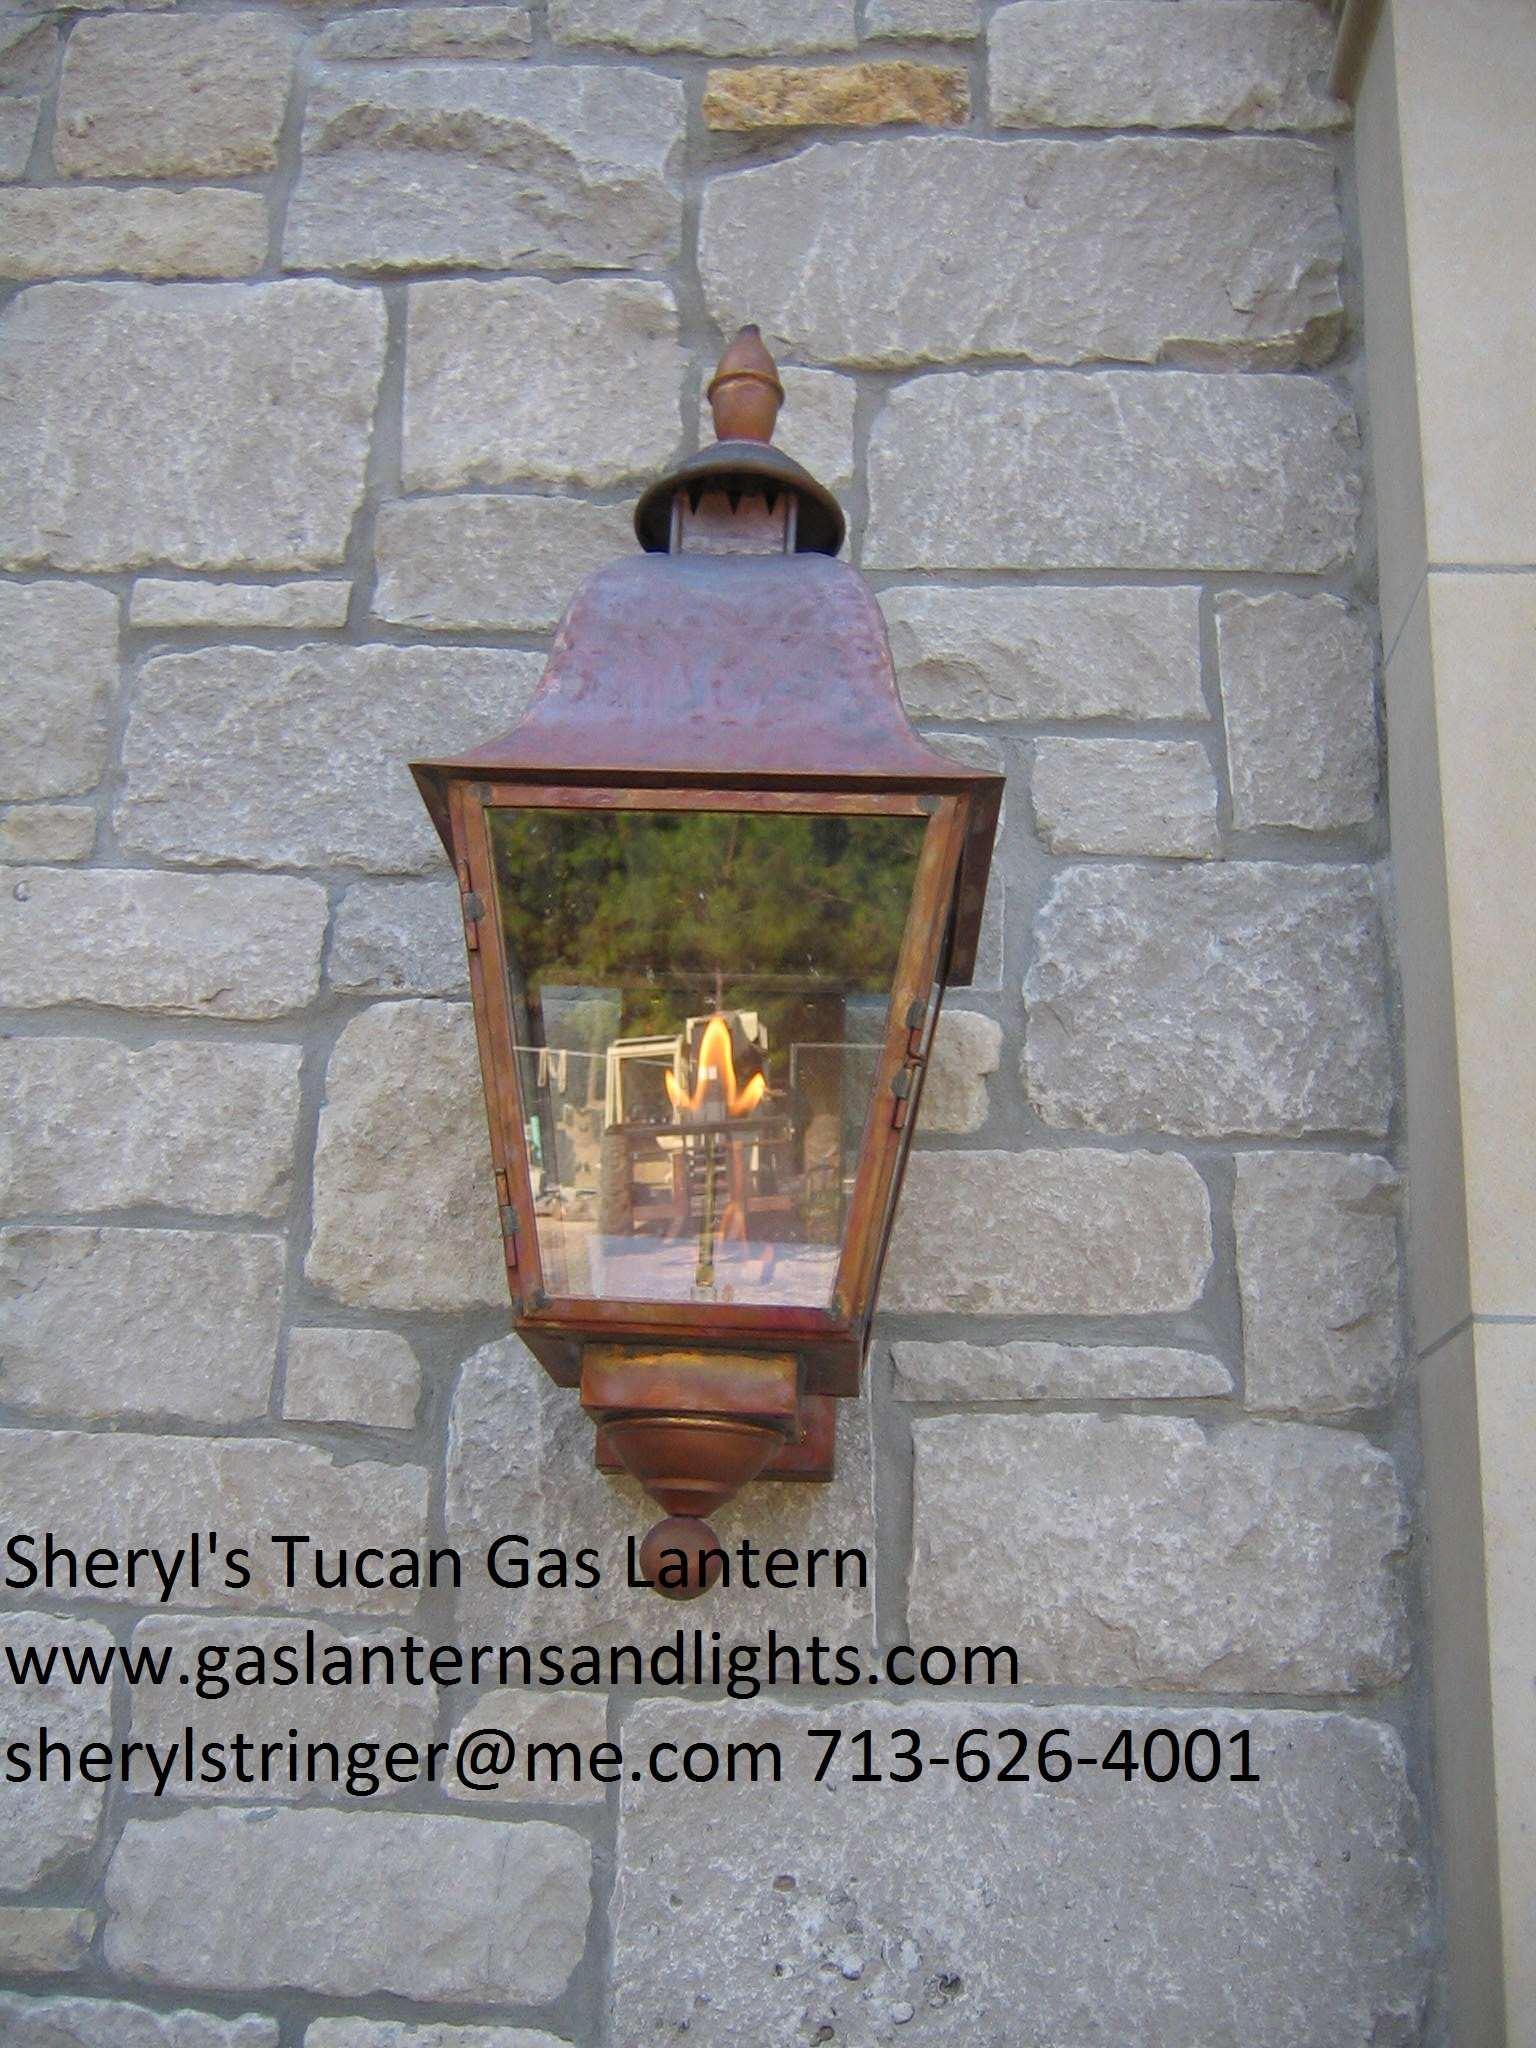 Sheryl's Tuscan Gas and Electric Lanterns